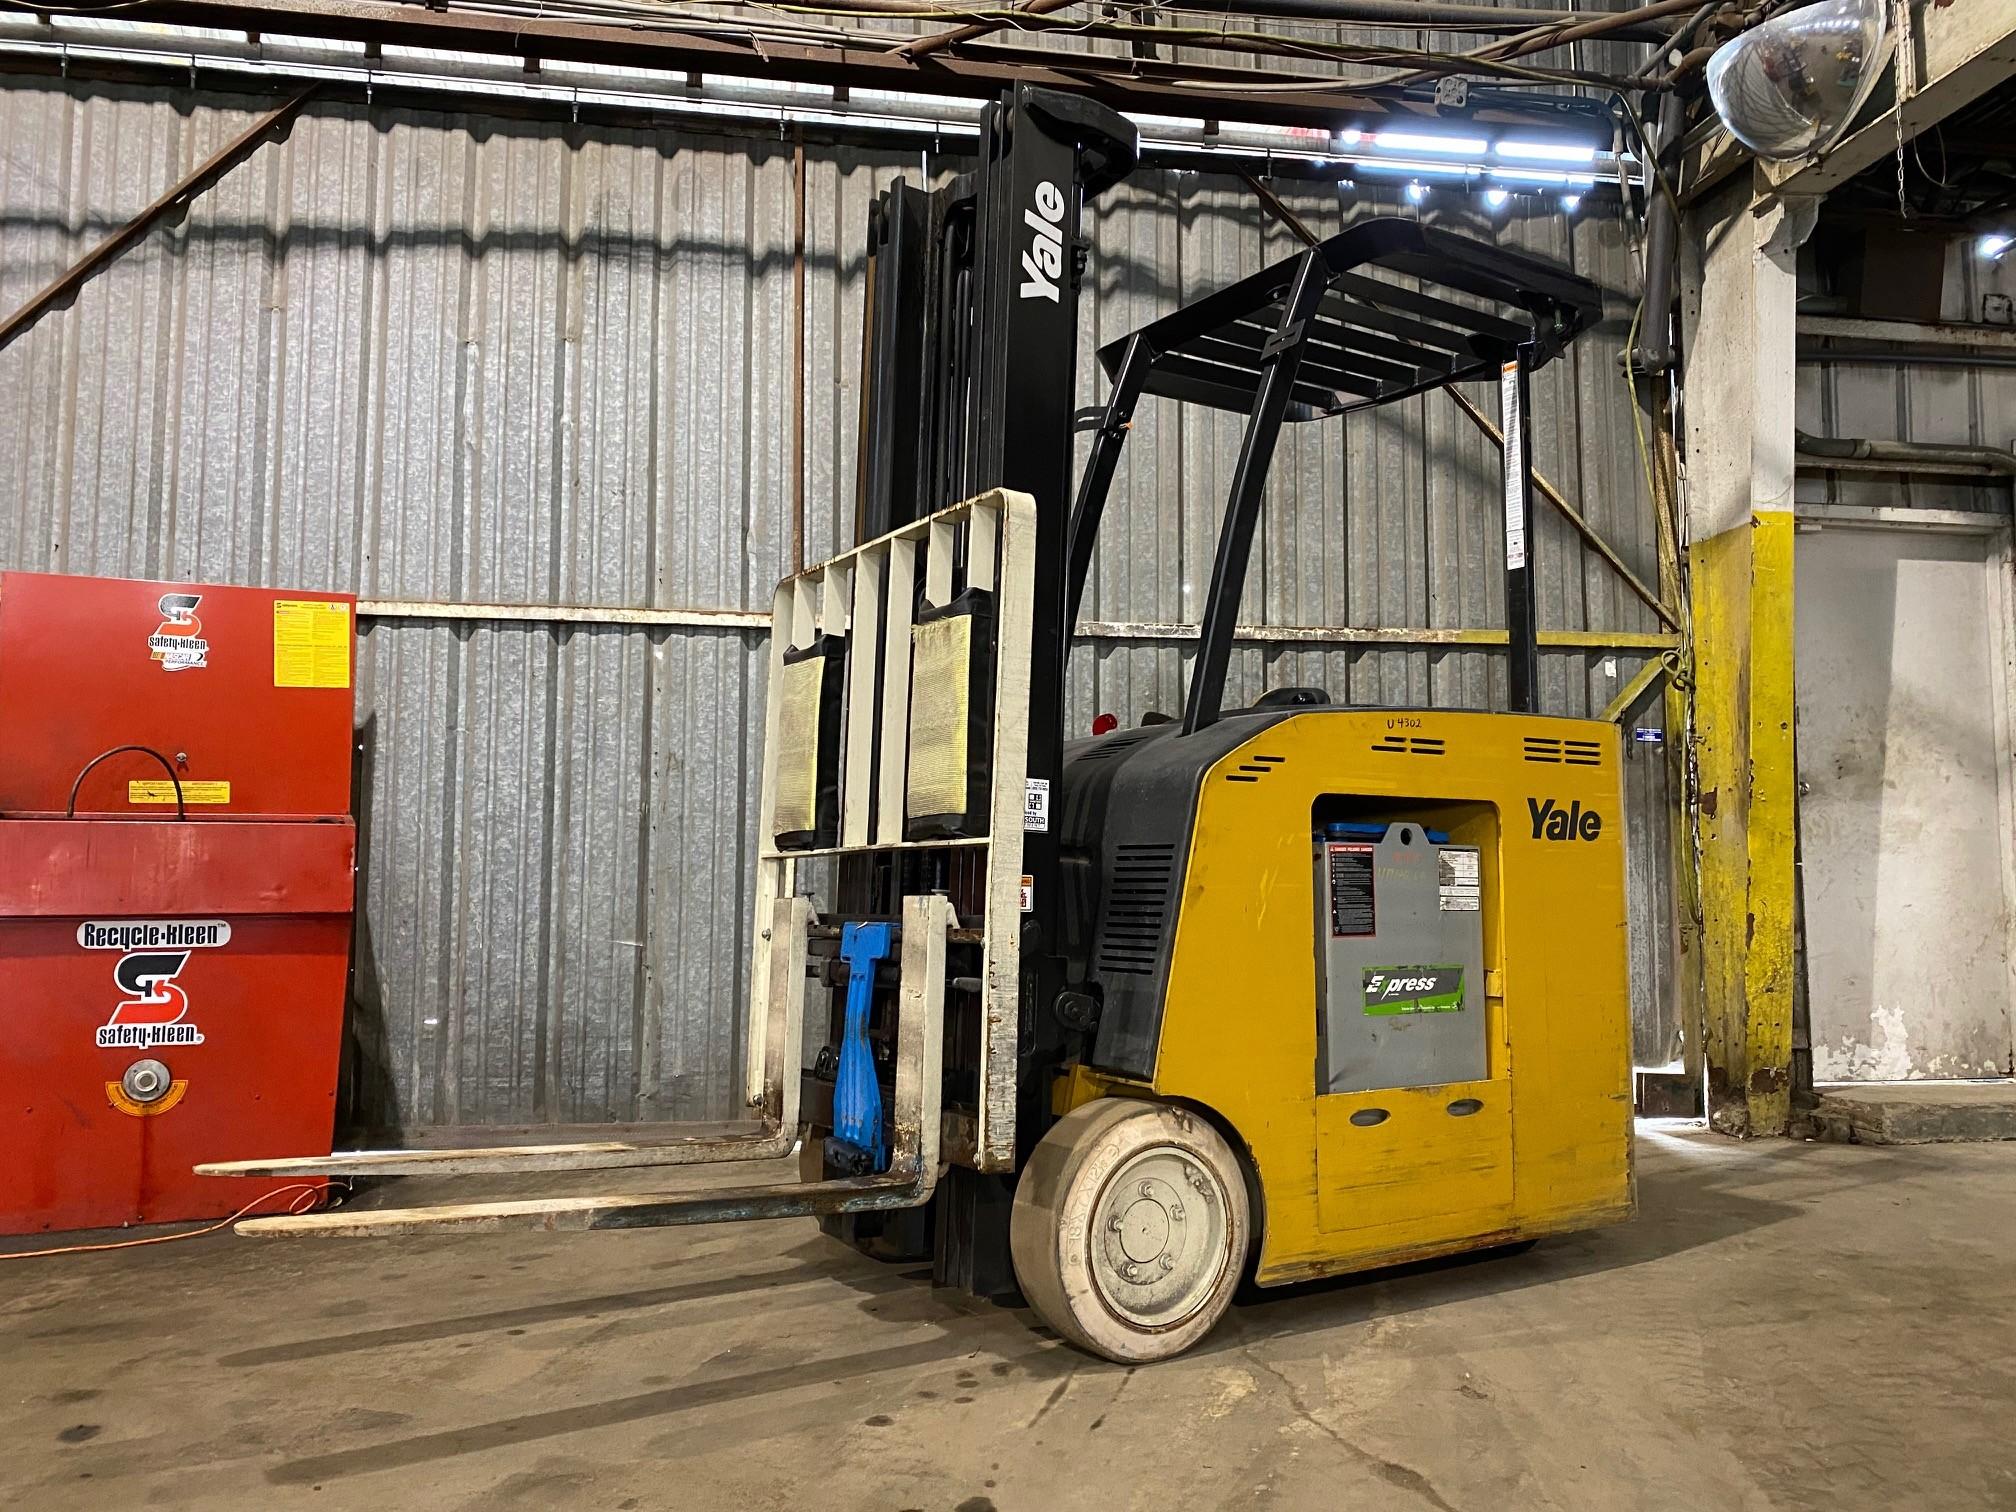 Used, 2009, Yale, ESC040FA, Forklifts / Lift Trucks